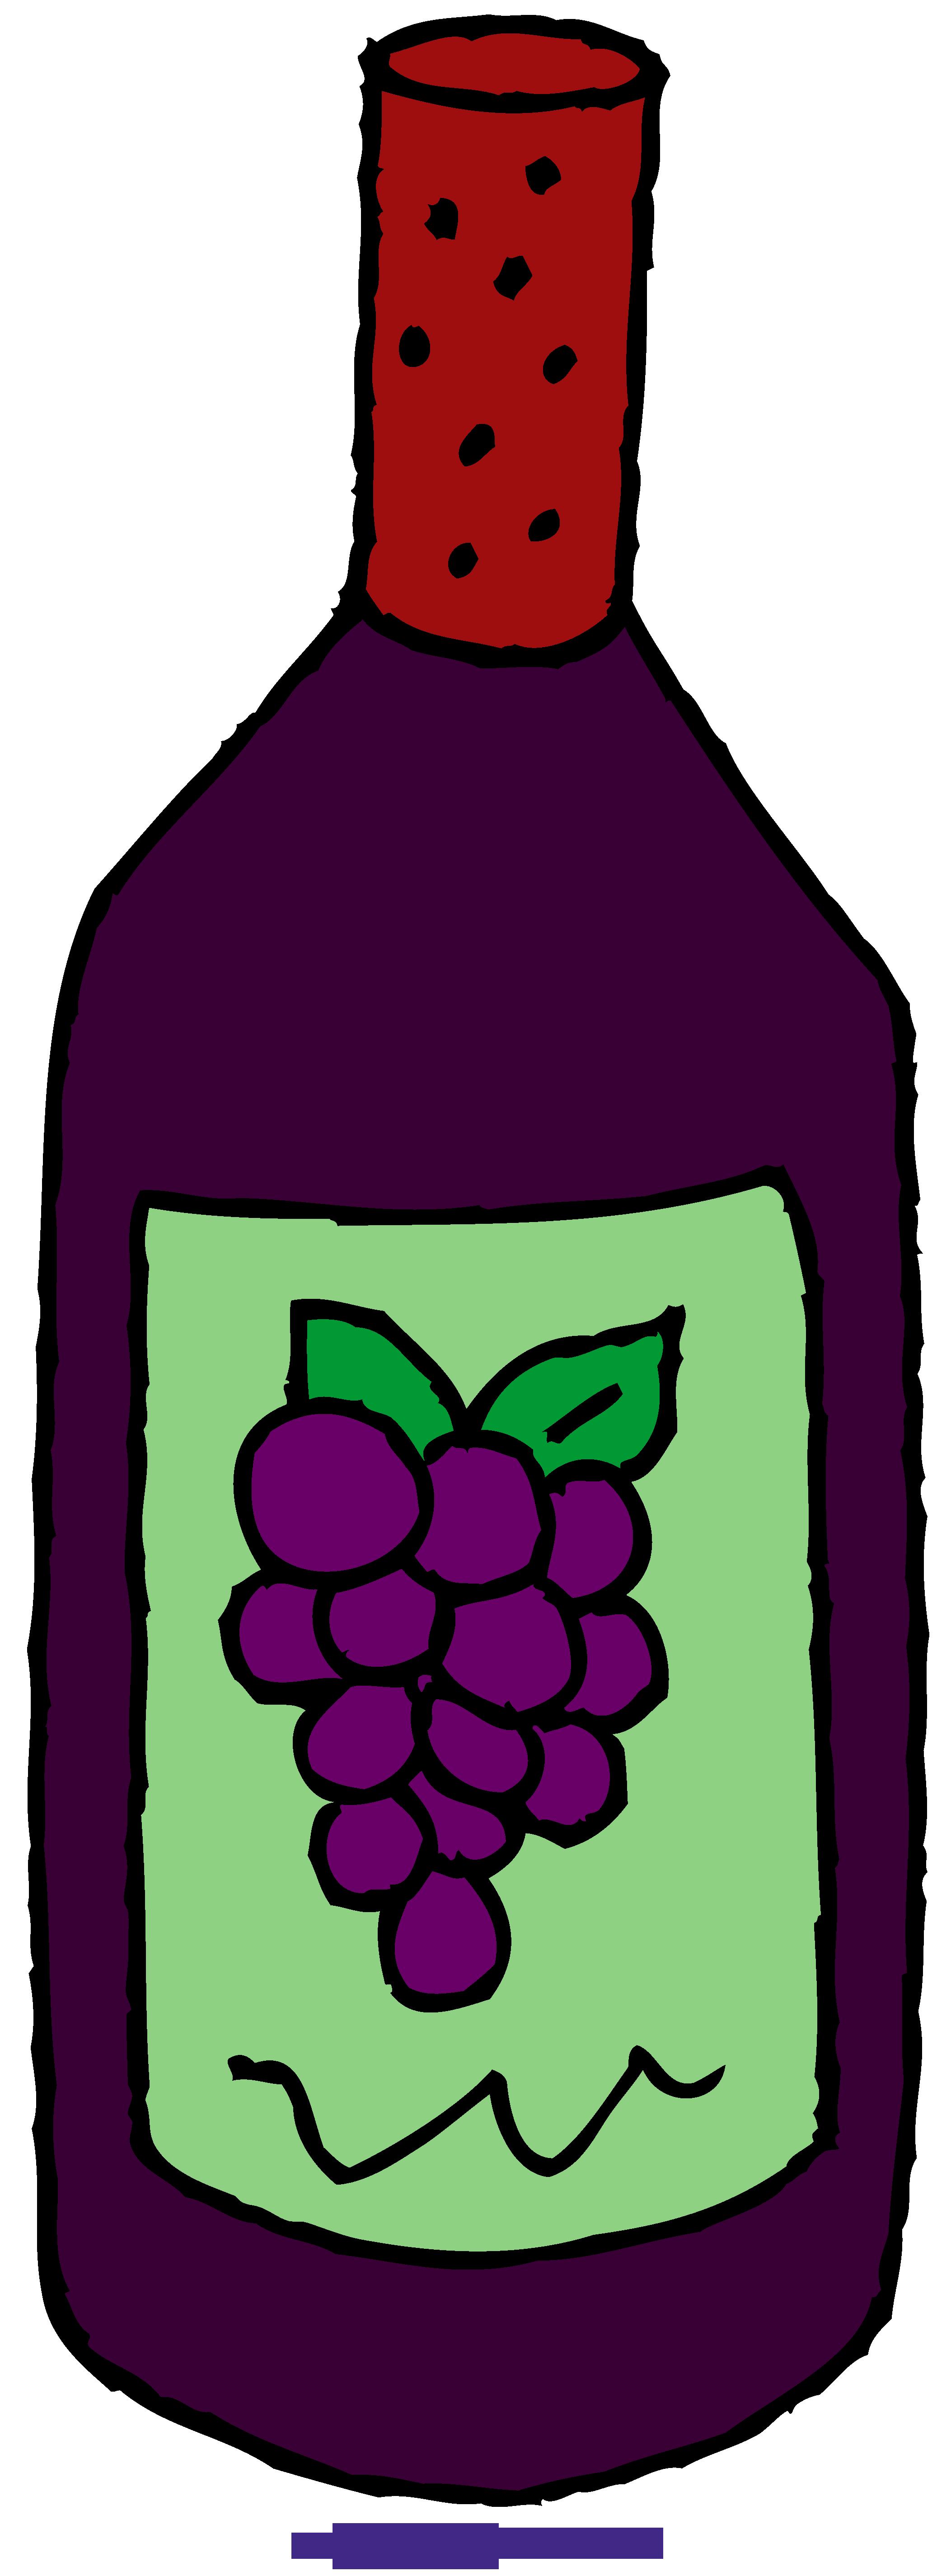 wine bottle clipart clipart sweet clip art rh m sweetclipart com wine bottle clip art images wine bottle clip art free